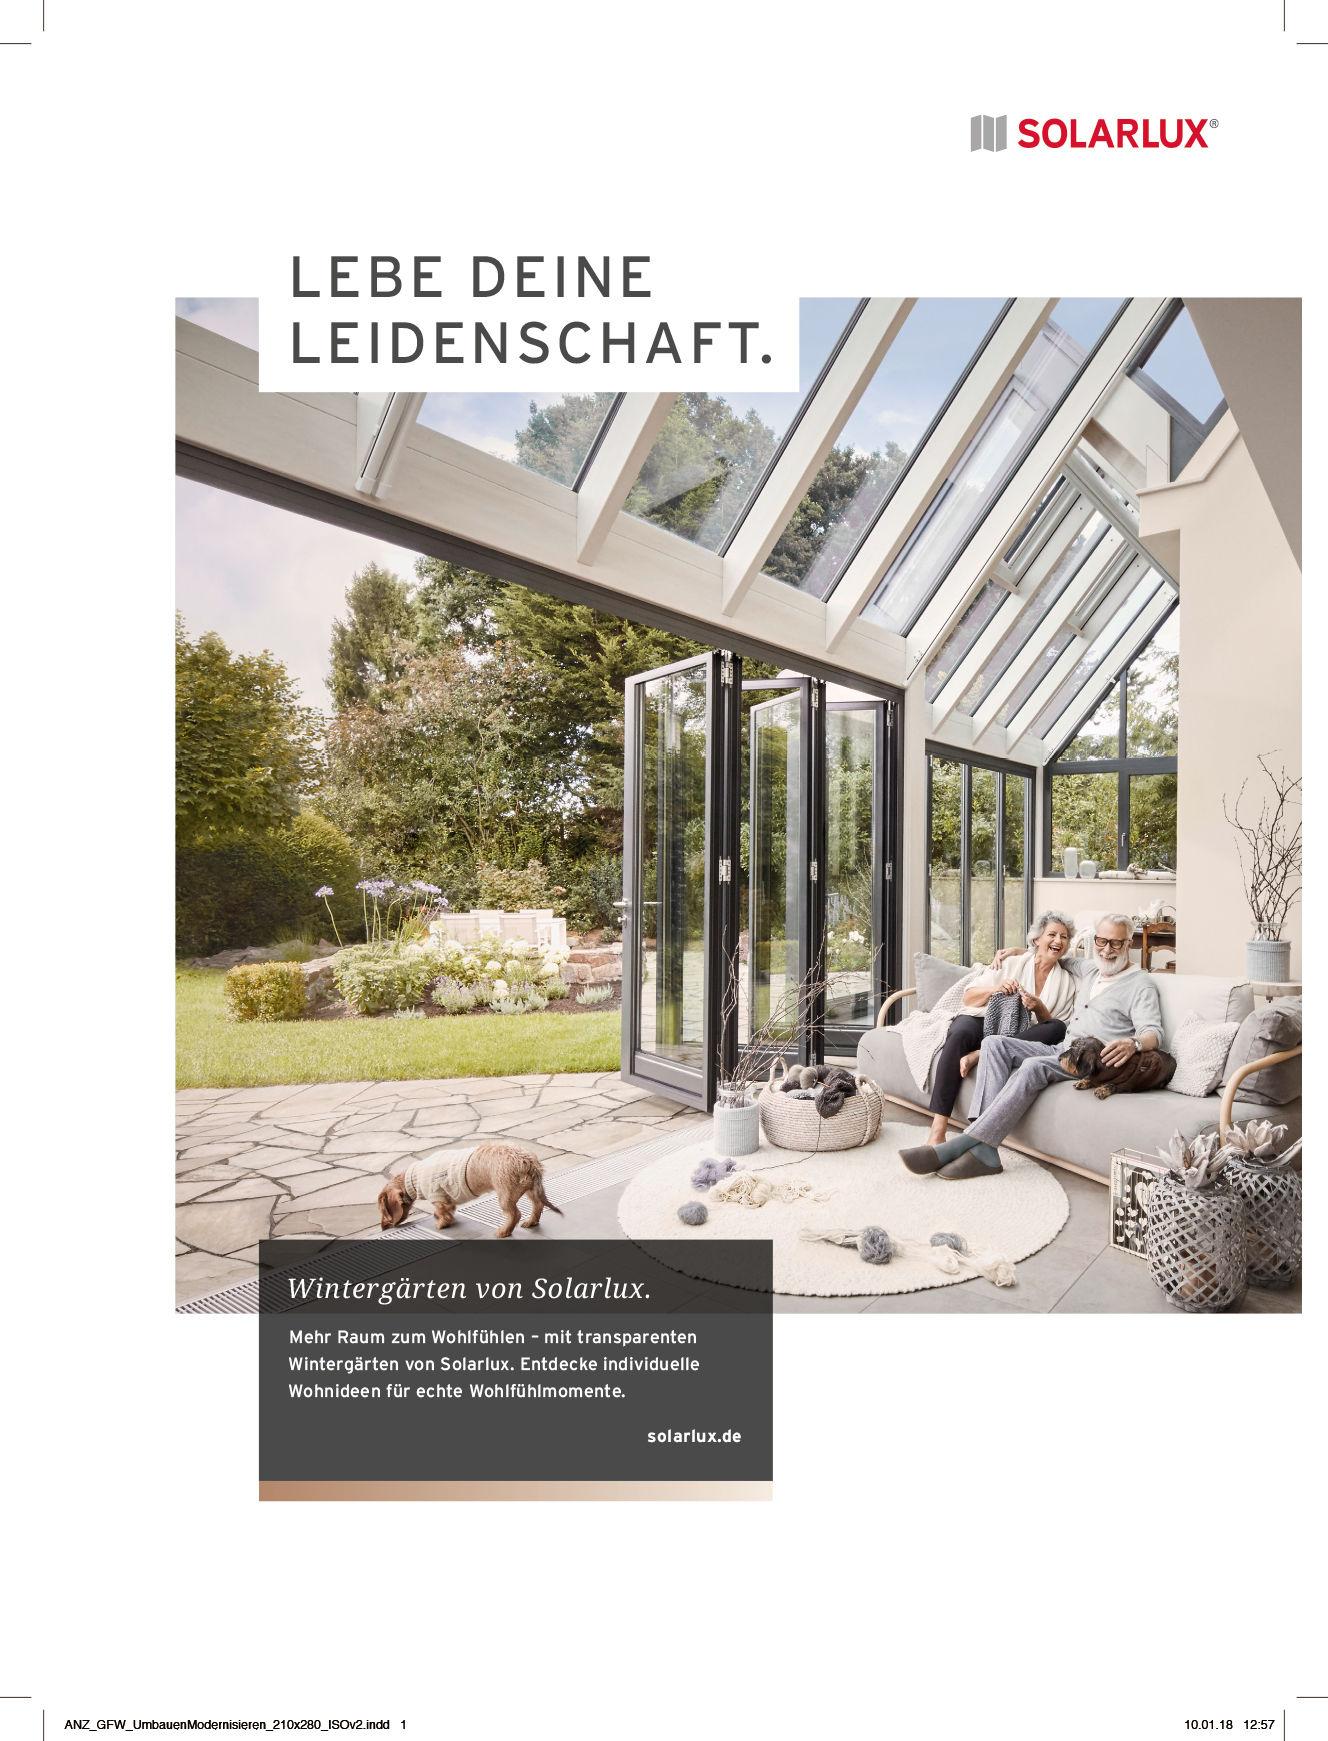 D. & A. Plattner GBR / fashion-styling and interior-design for Solarlux GmbH campaign: Lebe deine Leidenschaft.